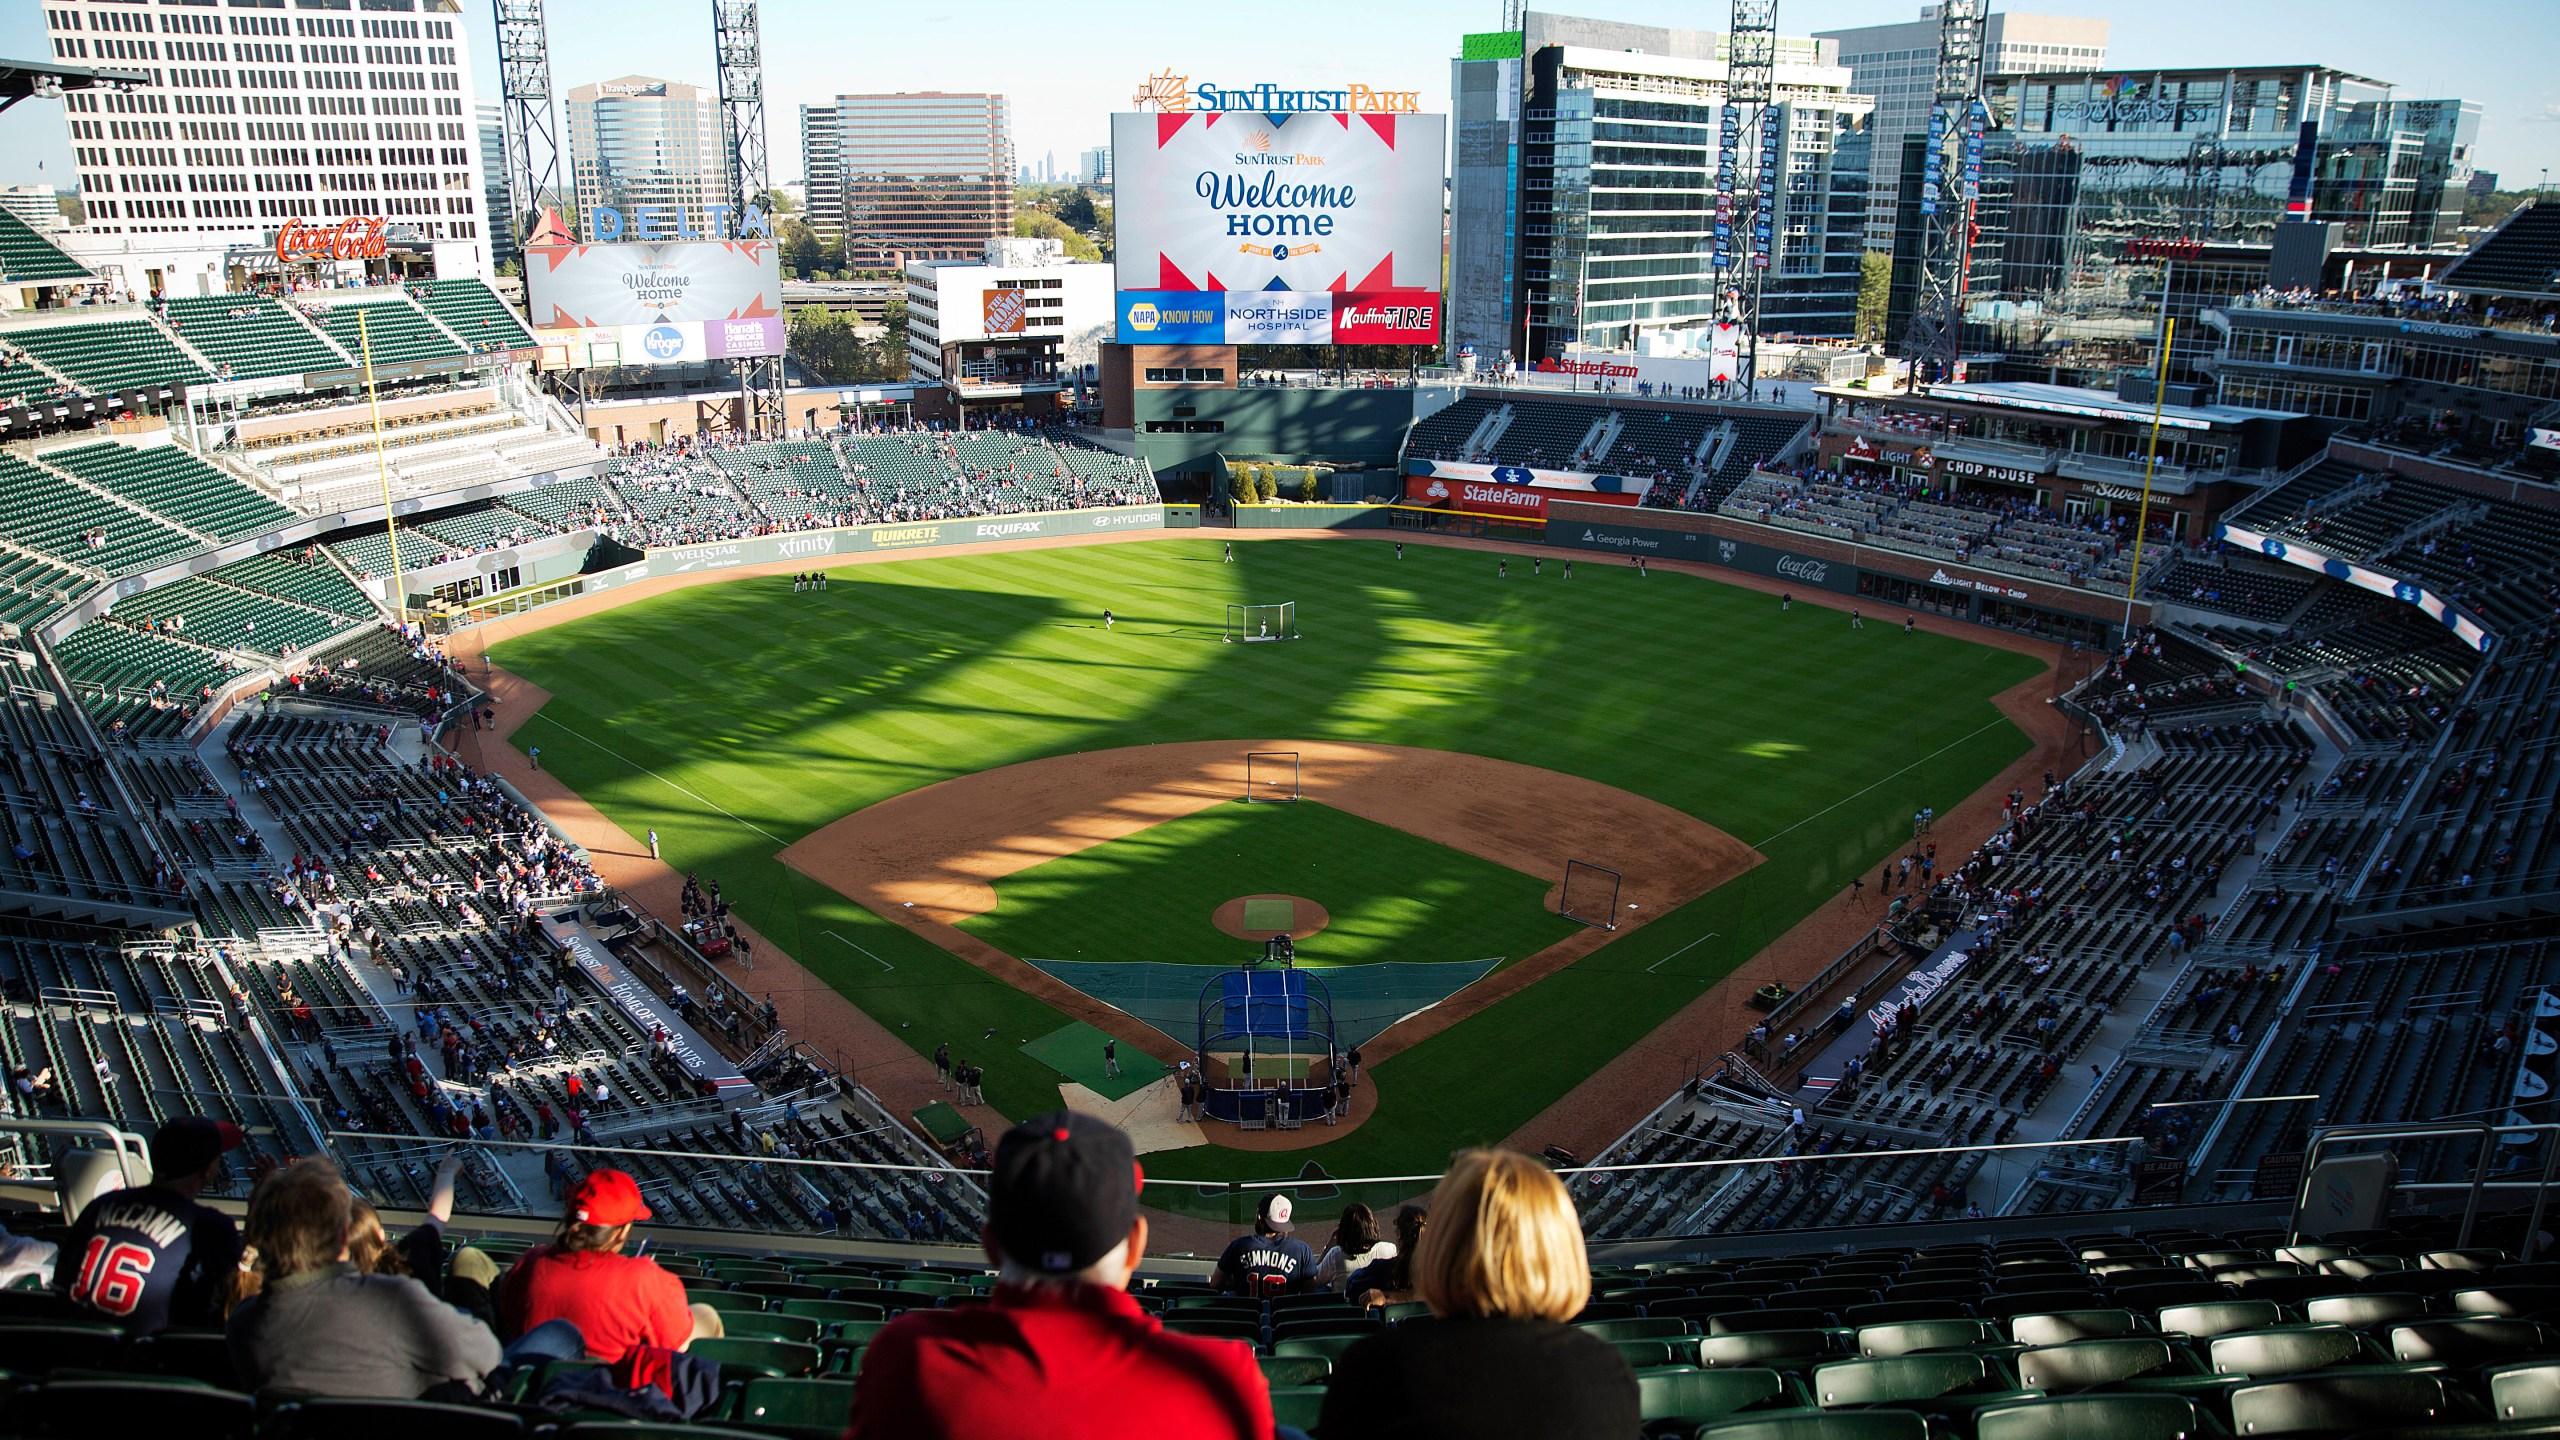 Atlanta-Braves-SunTrust-ballpark_1536918458616.jpg